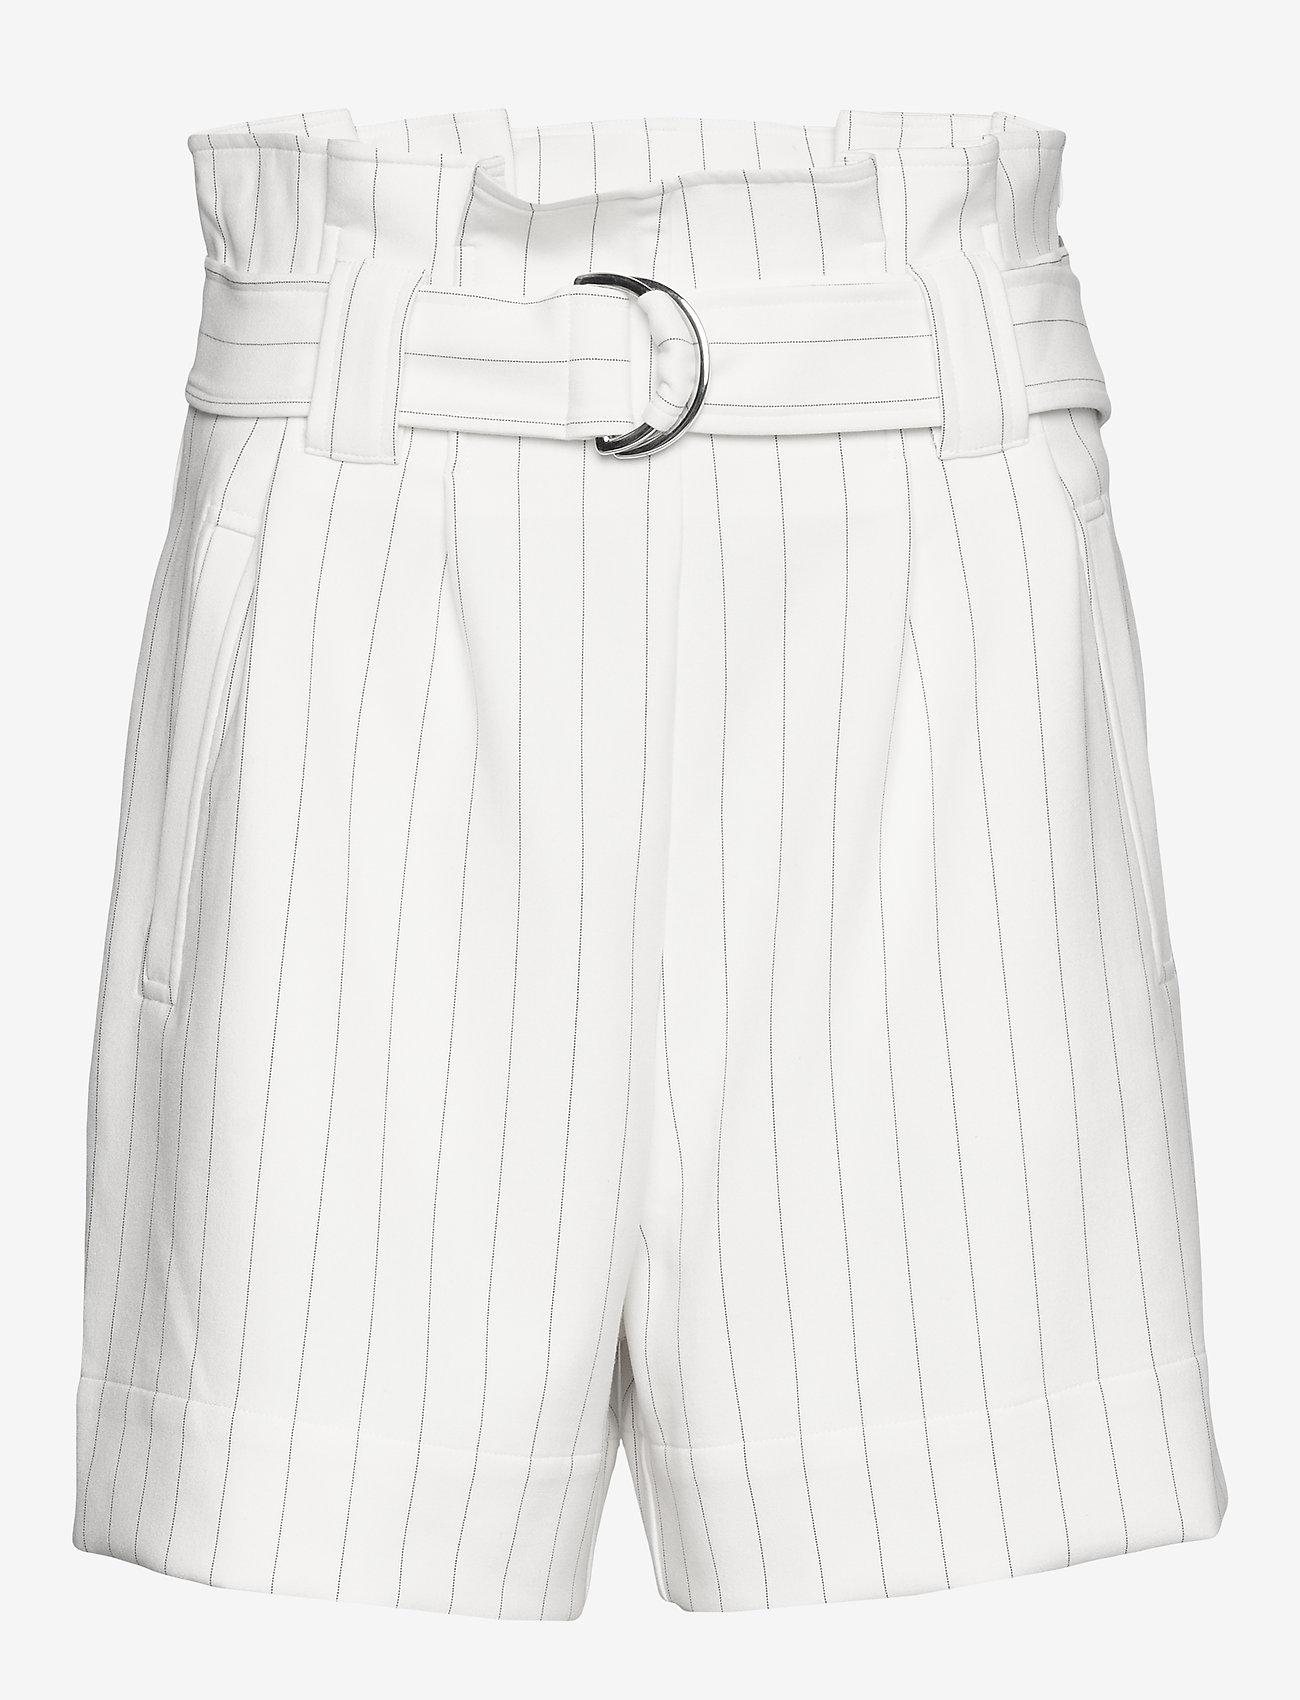 Ganni - Suiting - paper bag shorts - egret - 0